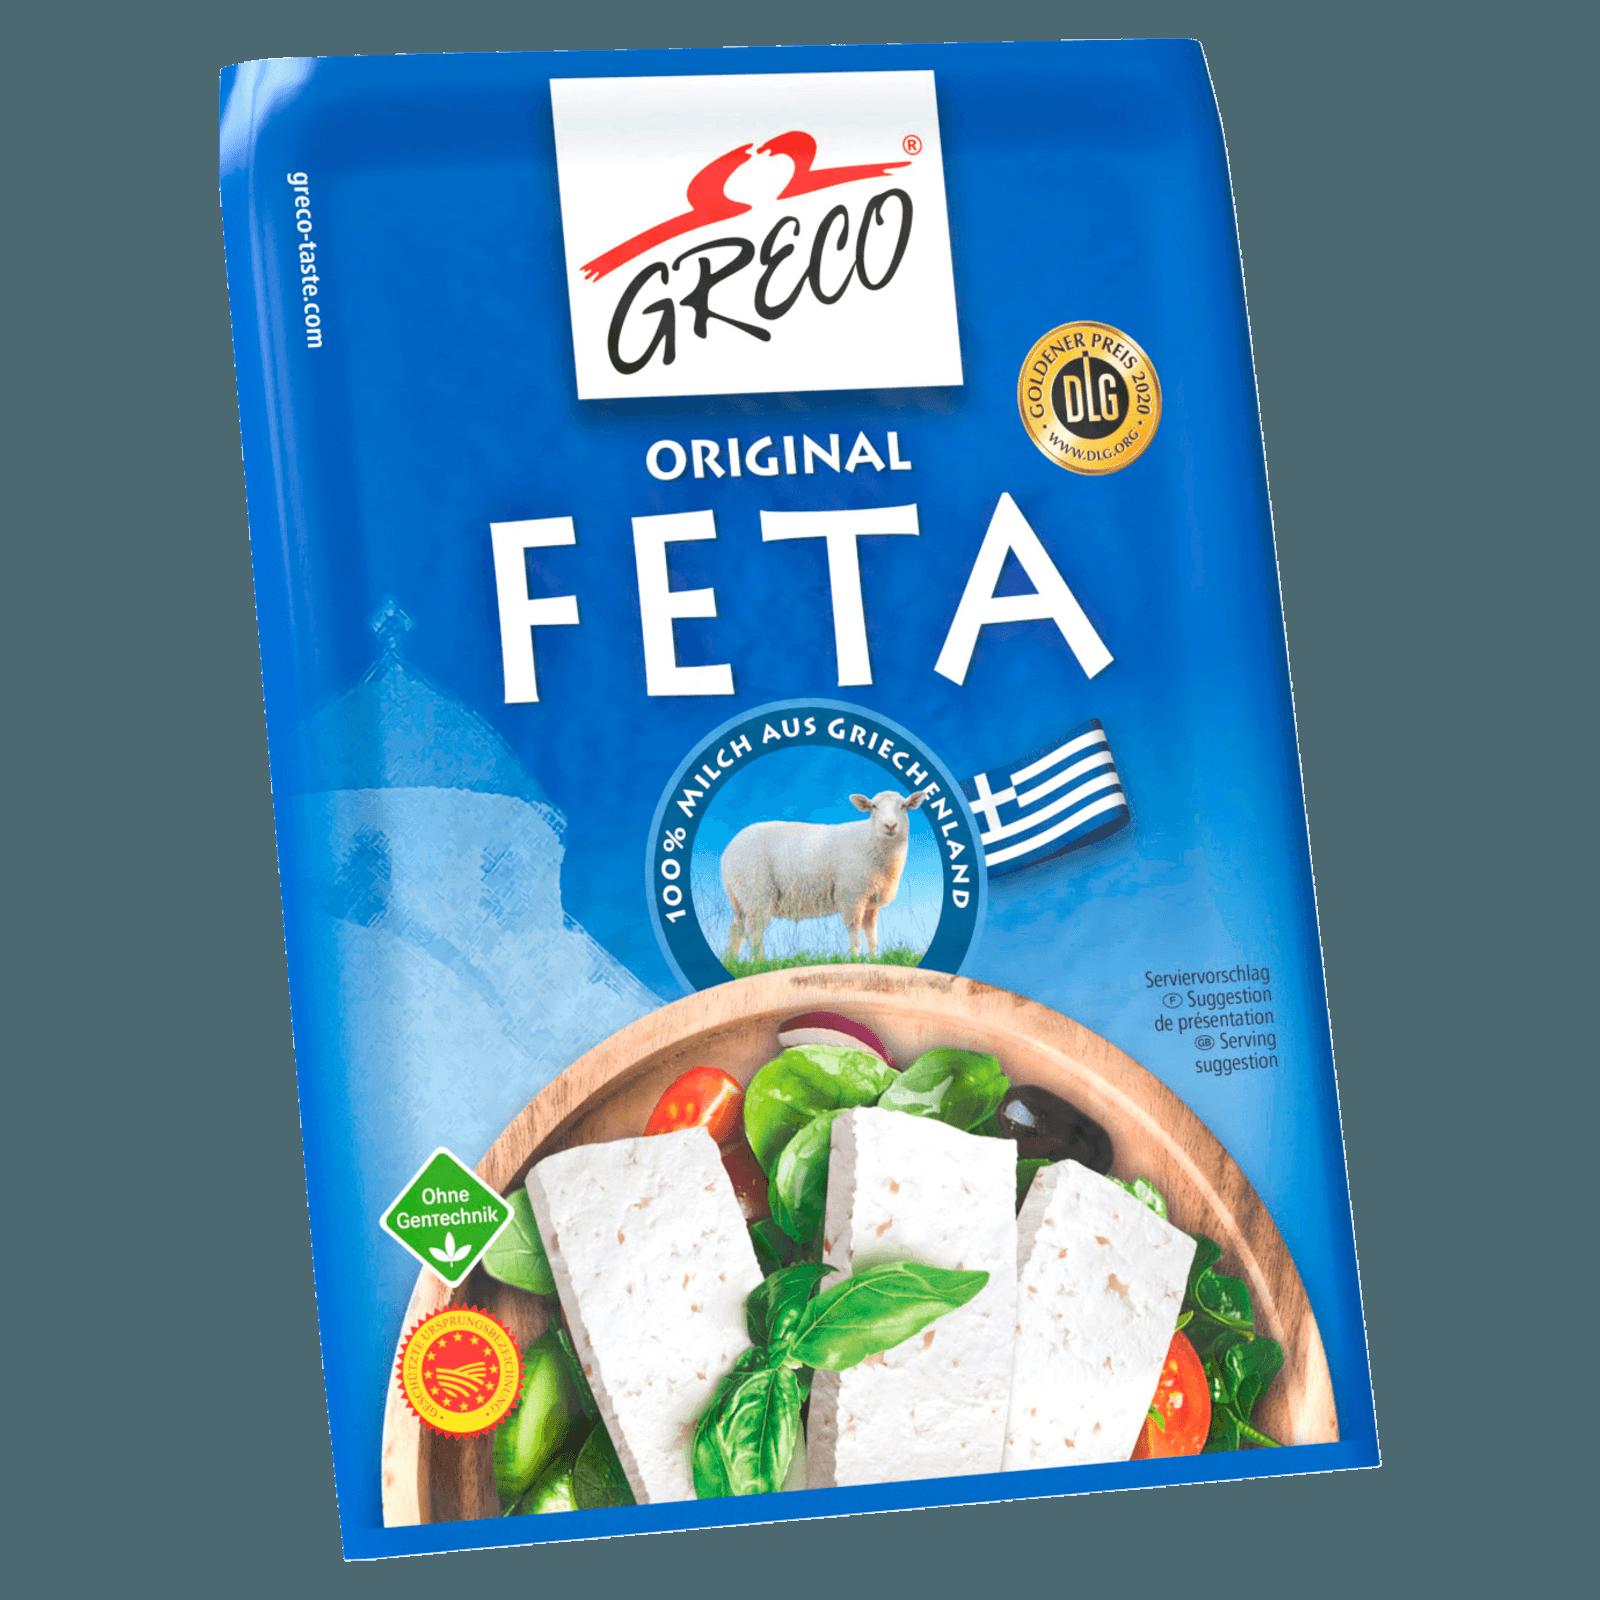 Greco Griechischer Feta 200g